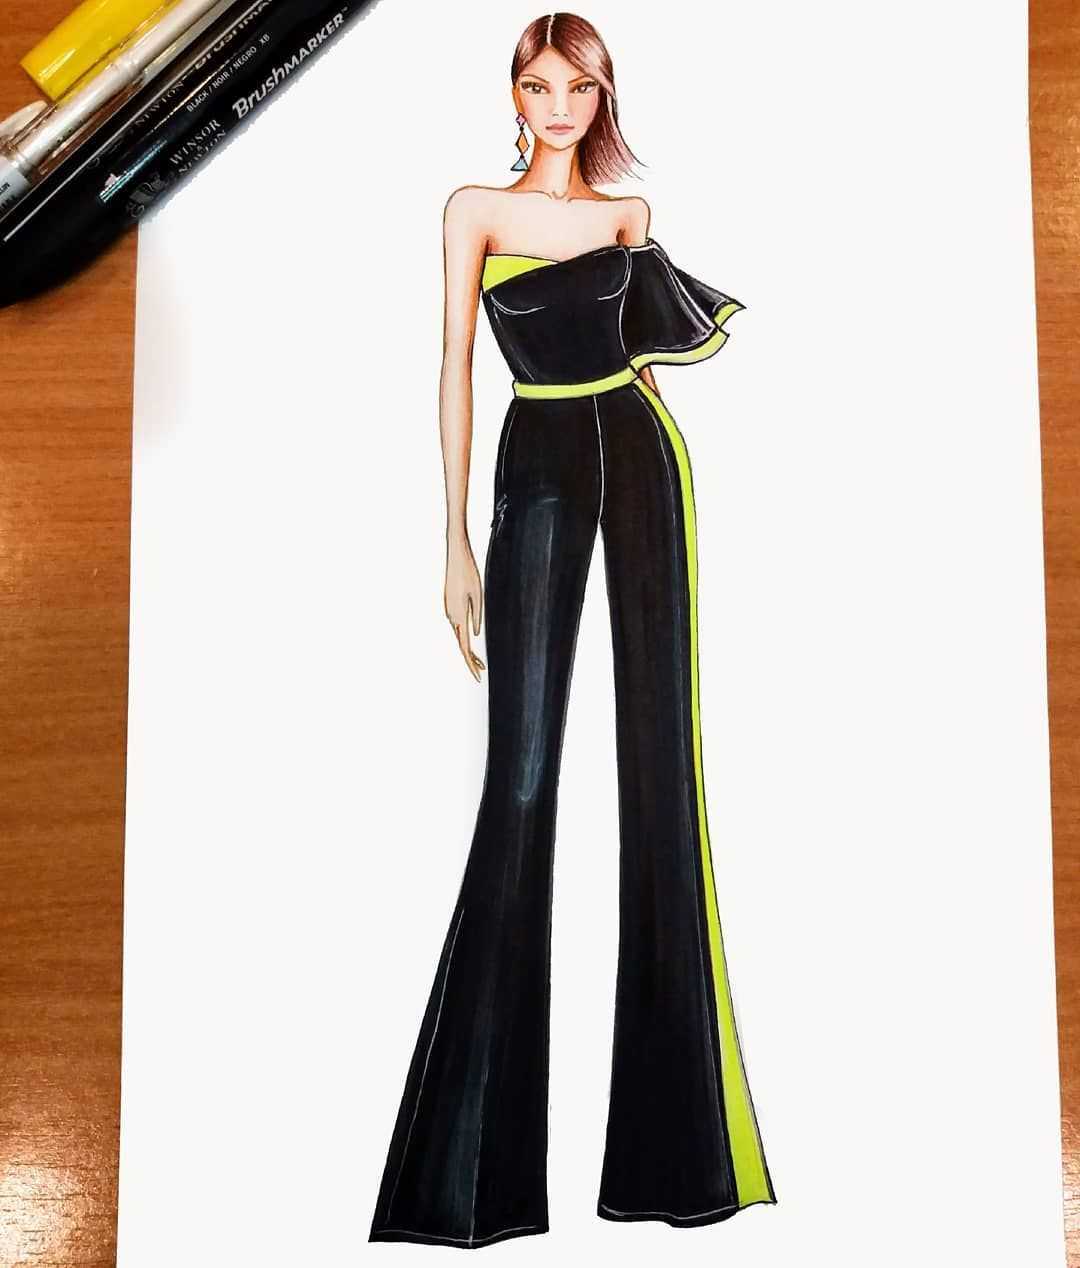 "Photo of Dragana Šebez Lukić on Instagram: ""Play with neon . . . . . #fashion#fashioninspiration #fashiondesigner #fashiondesign #fashionillustrator #fashionillustration #fashionart…"""